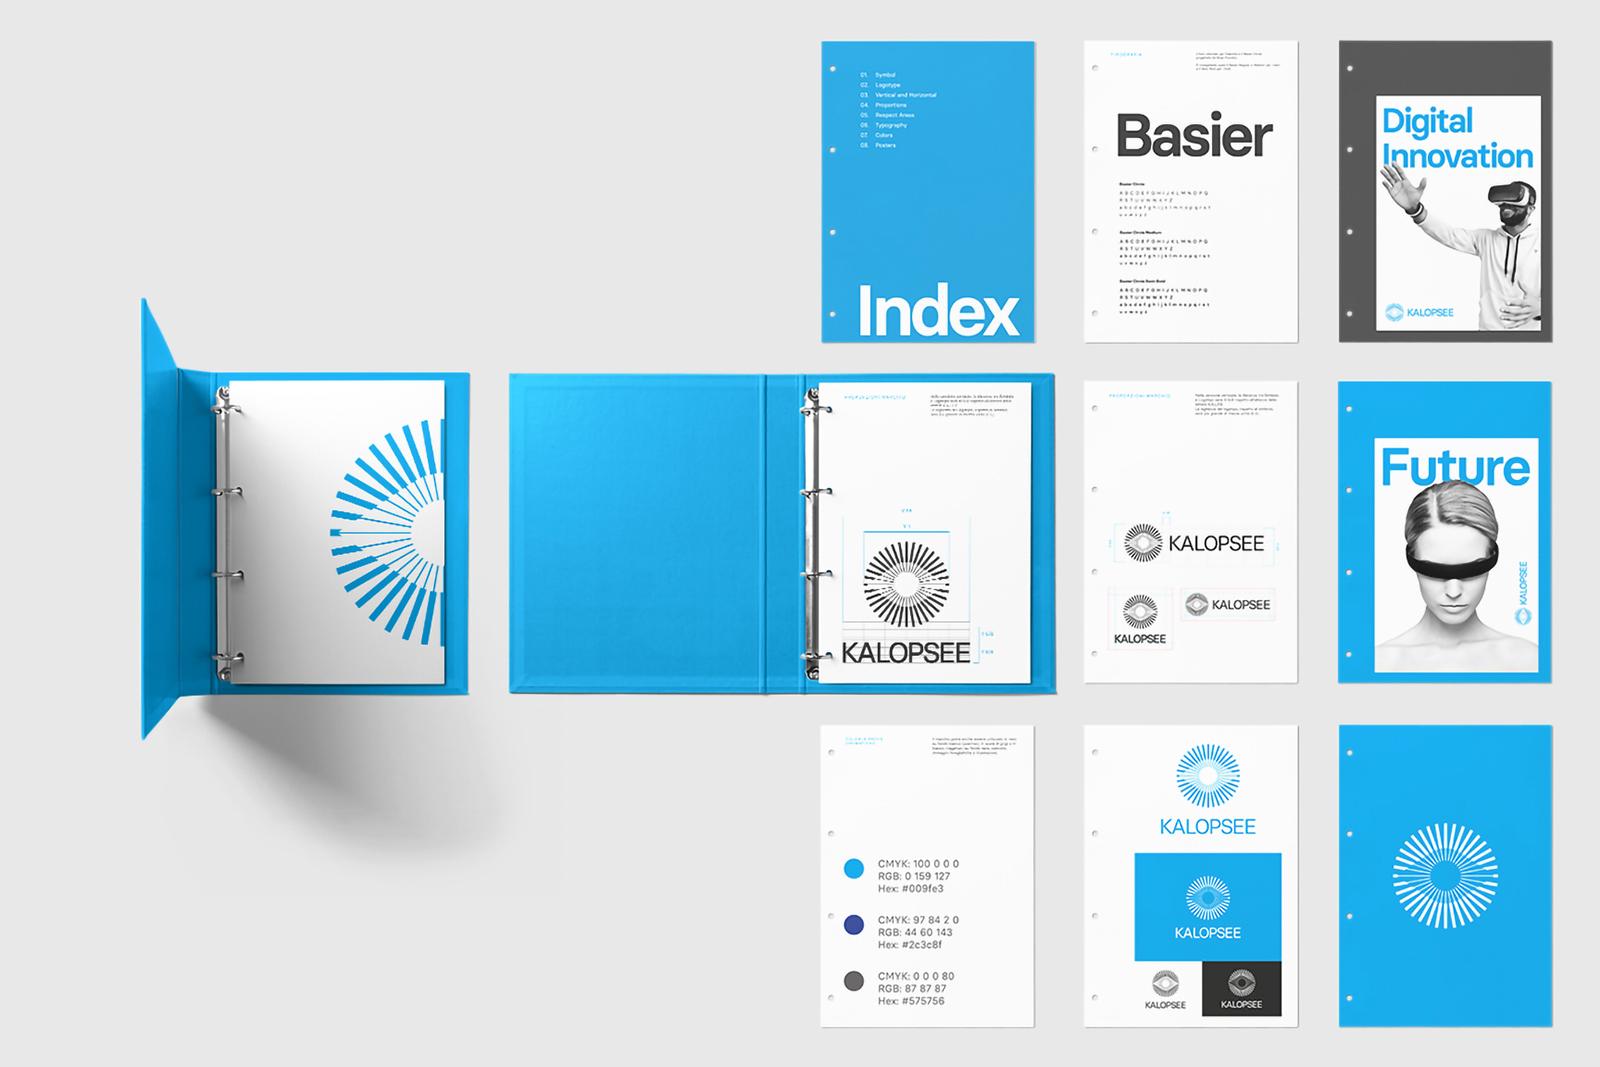 Kalopsee - Manuale del marchio